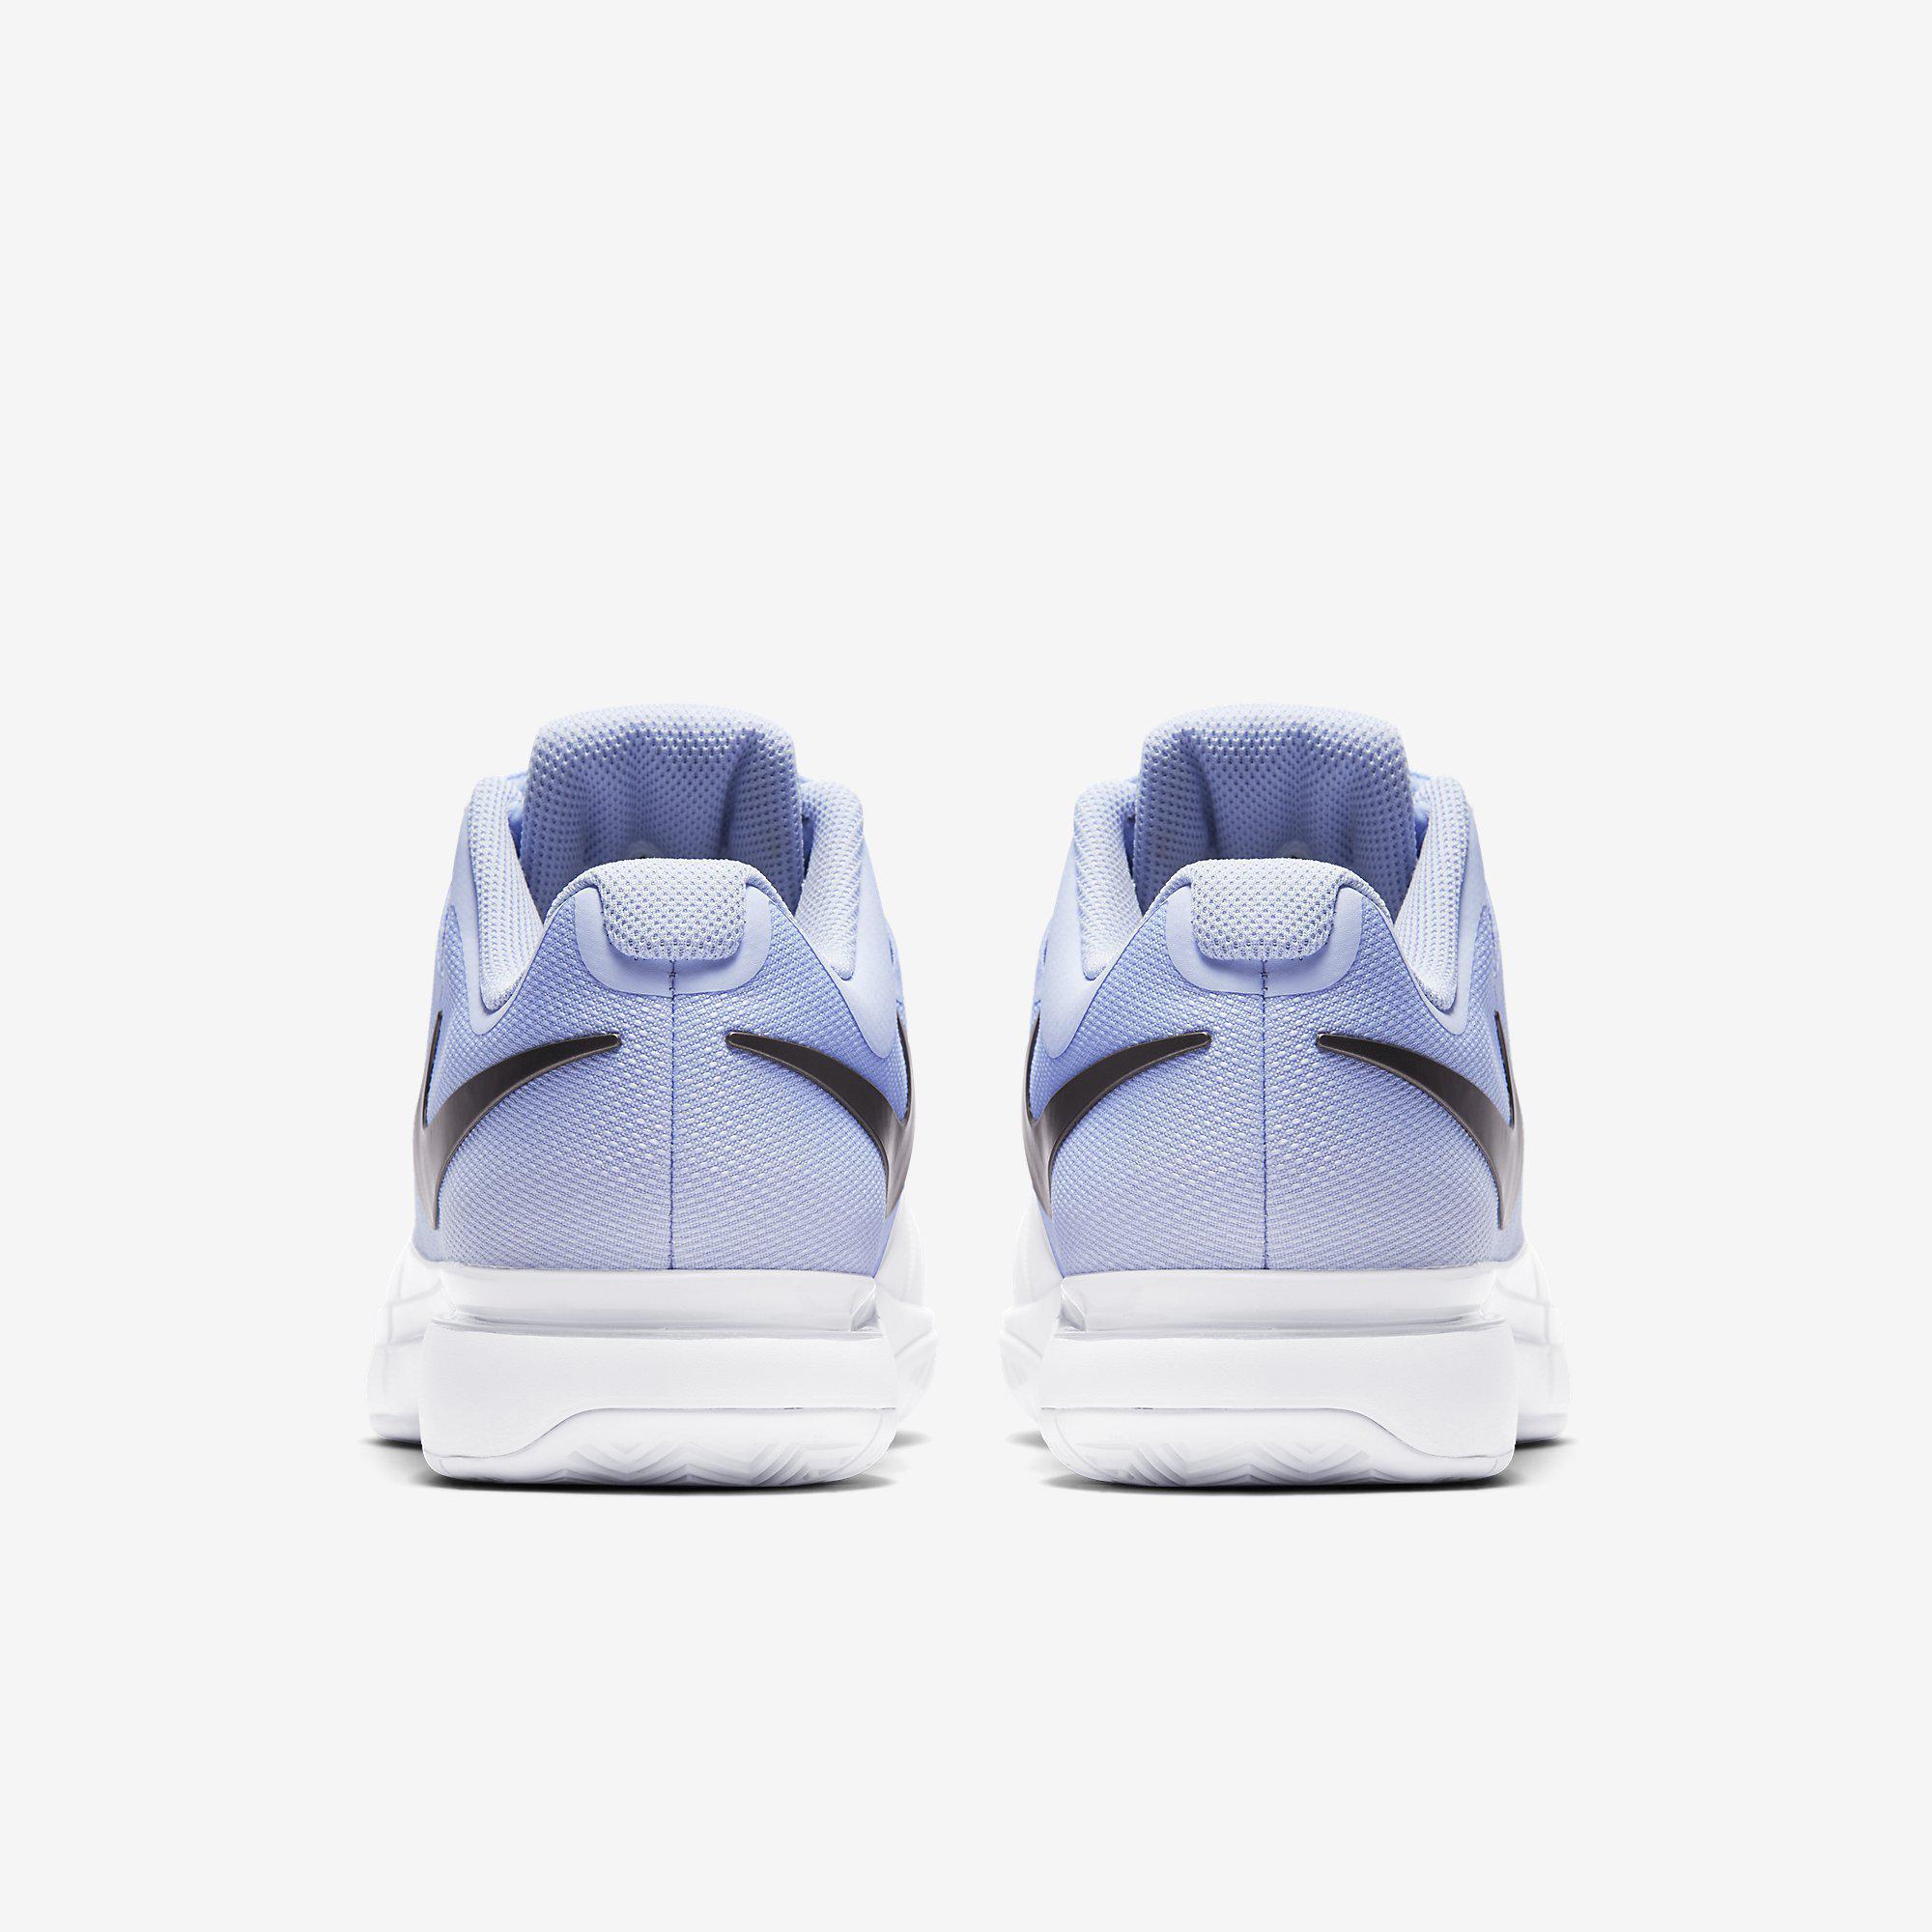 new product cc0b9 8b18b Nike Womens Zoom Vapor 9.5 Tennis Shoes - Hydrogen Blue White